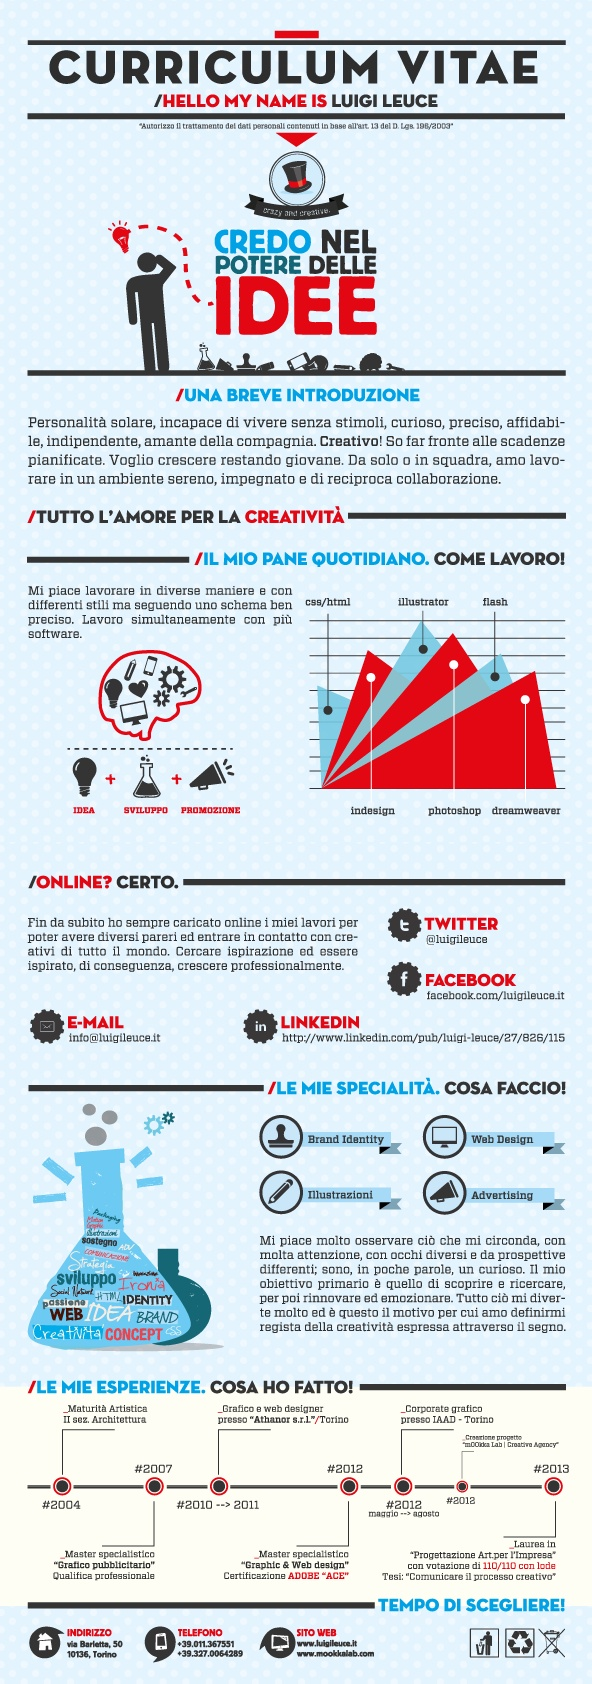 Ampoule laureen luhn design graphique - My Curriculum Vitae Infographic By Luigi Leuce Www Luigileuce It